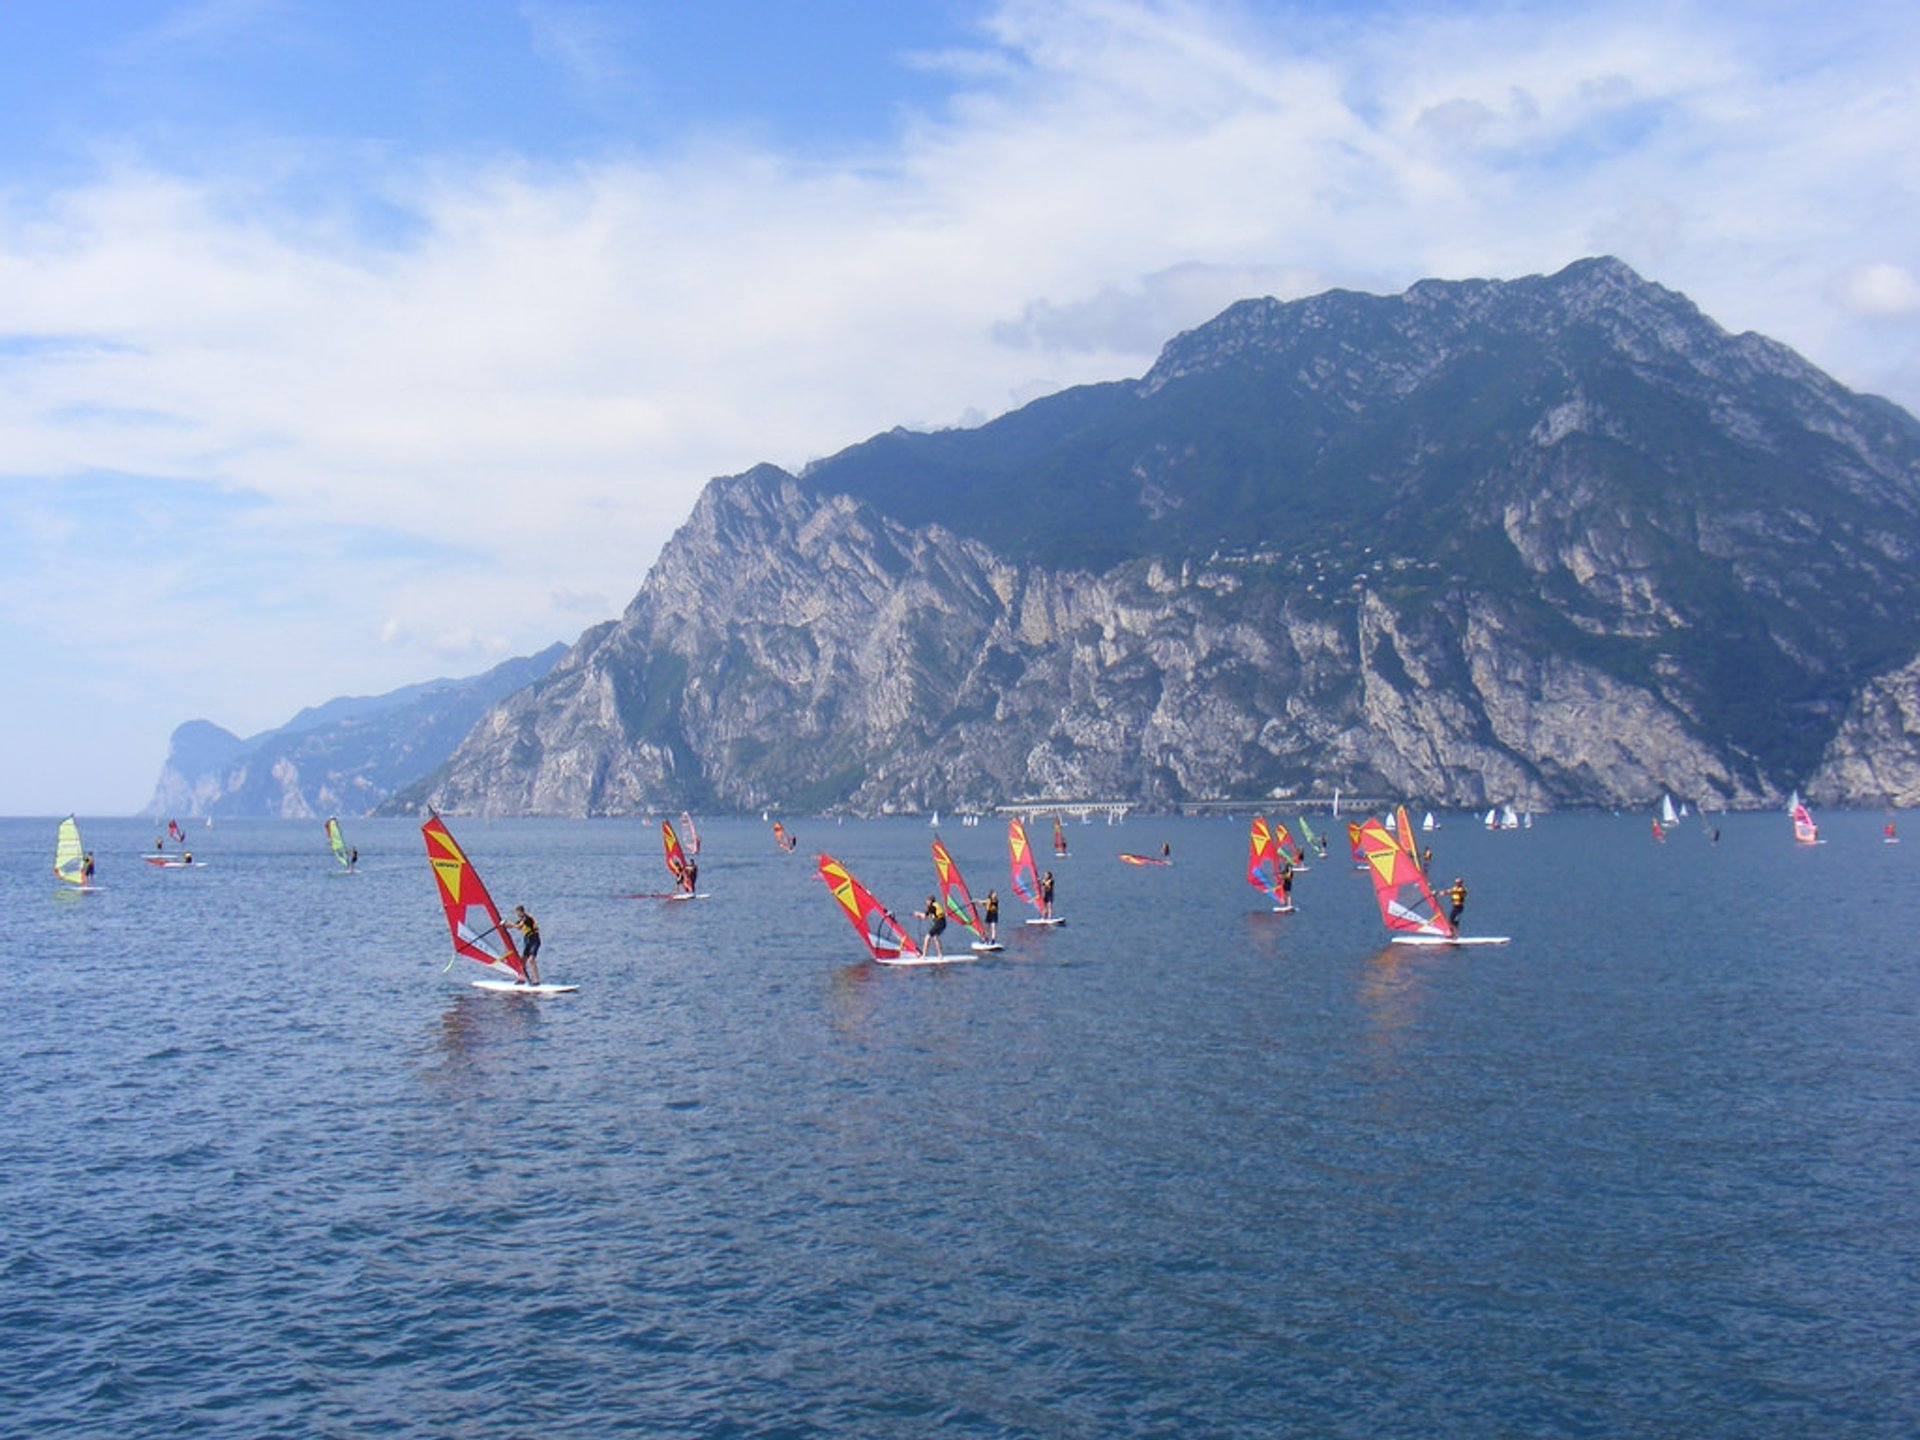 Windsurfing in Lake Garda, Italy 2020